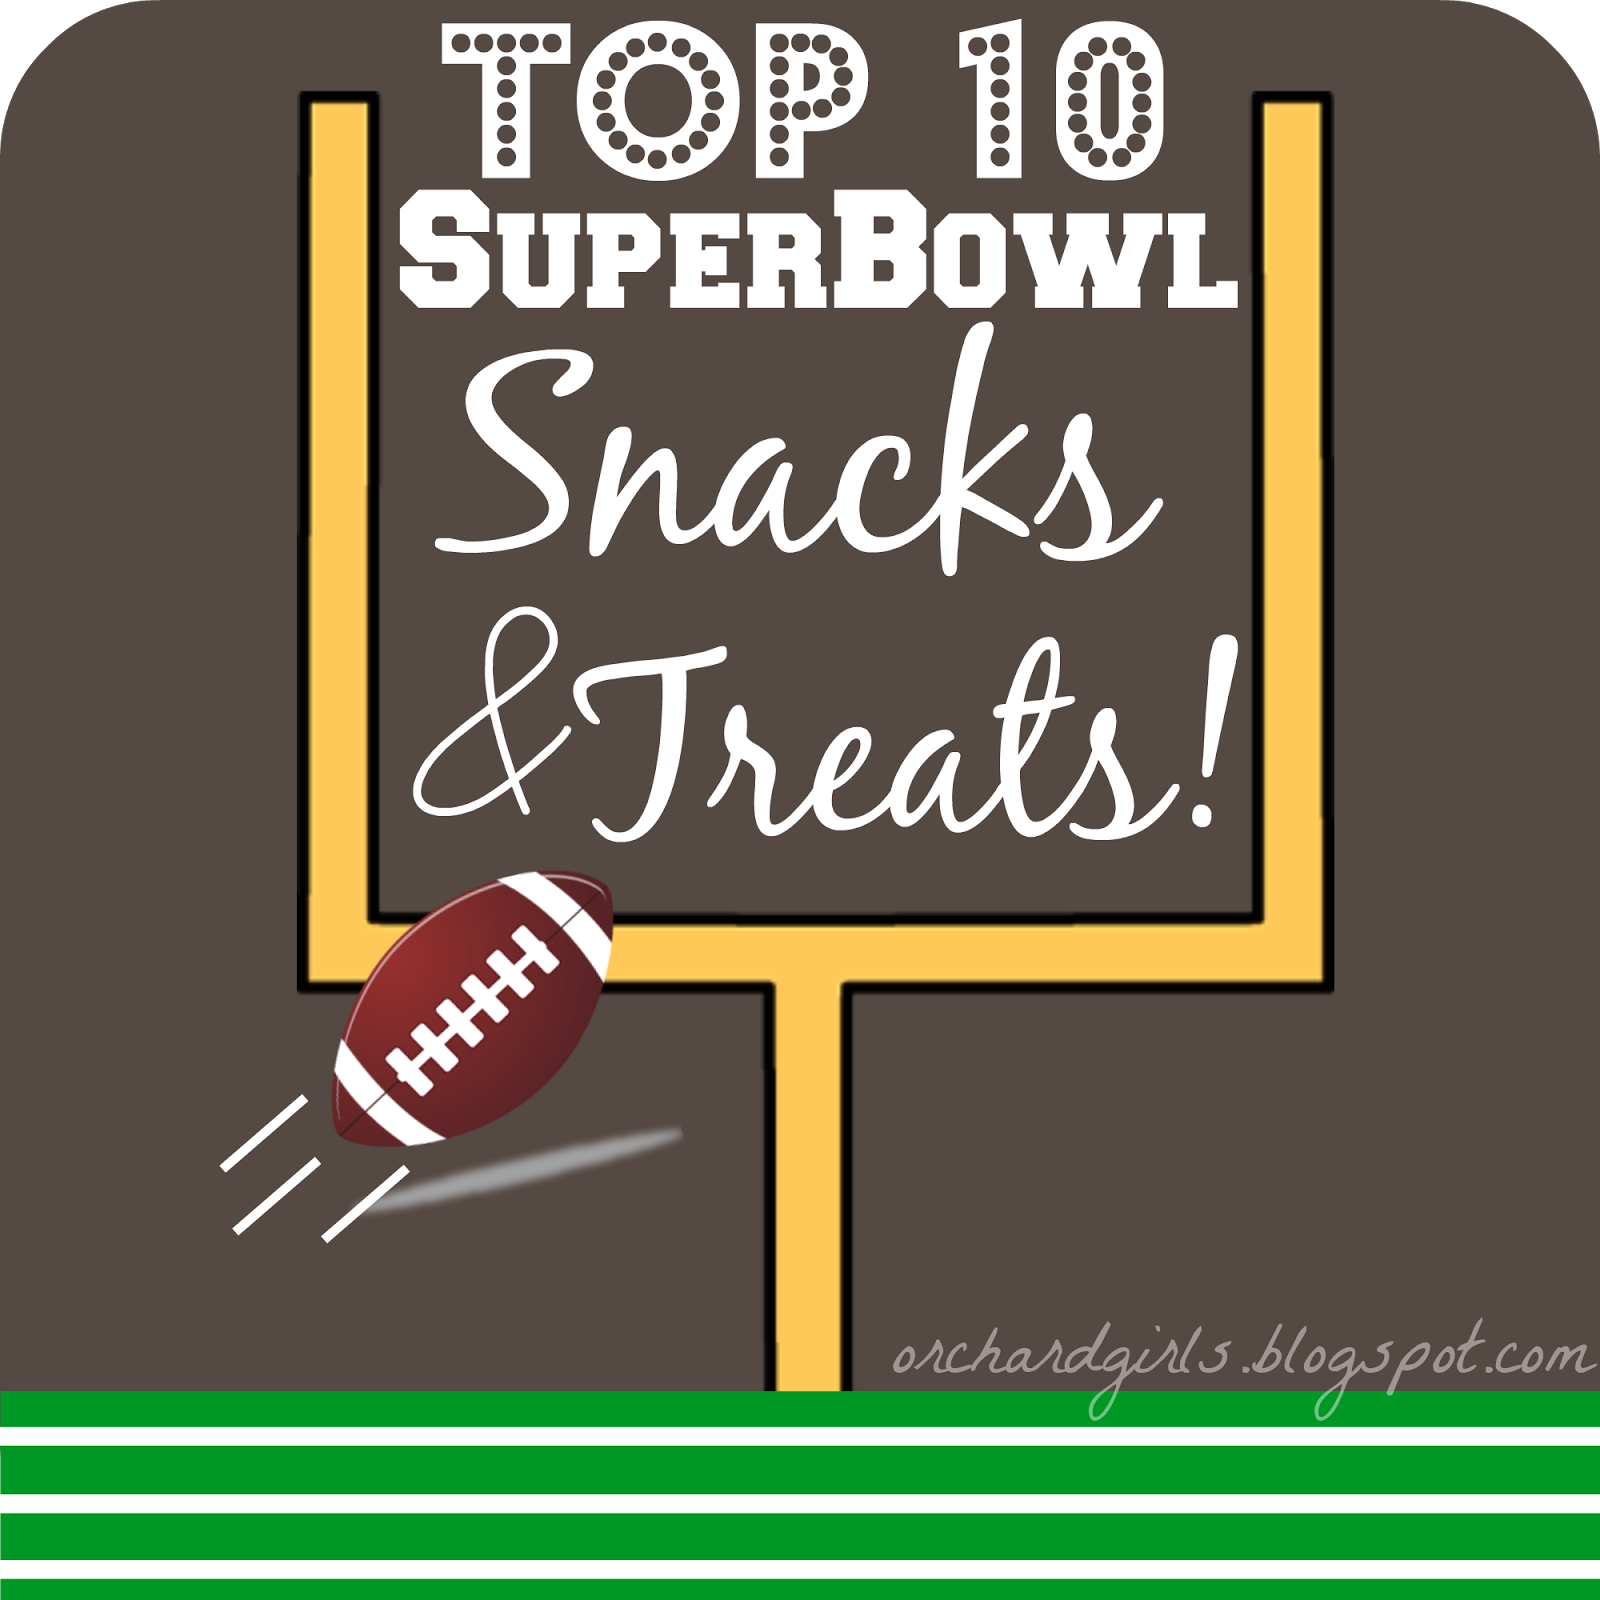 Super Bowl Food: 11 Amazing/Disgusting Snack Stadiums ... |Super Bowl Goodies